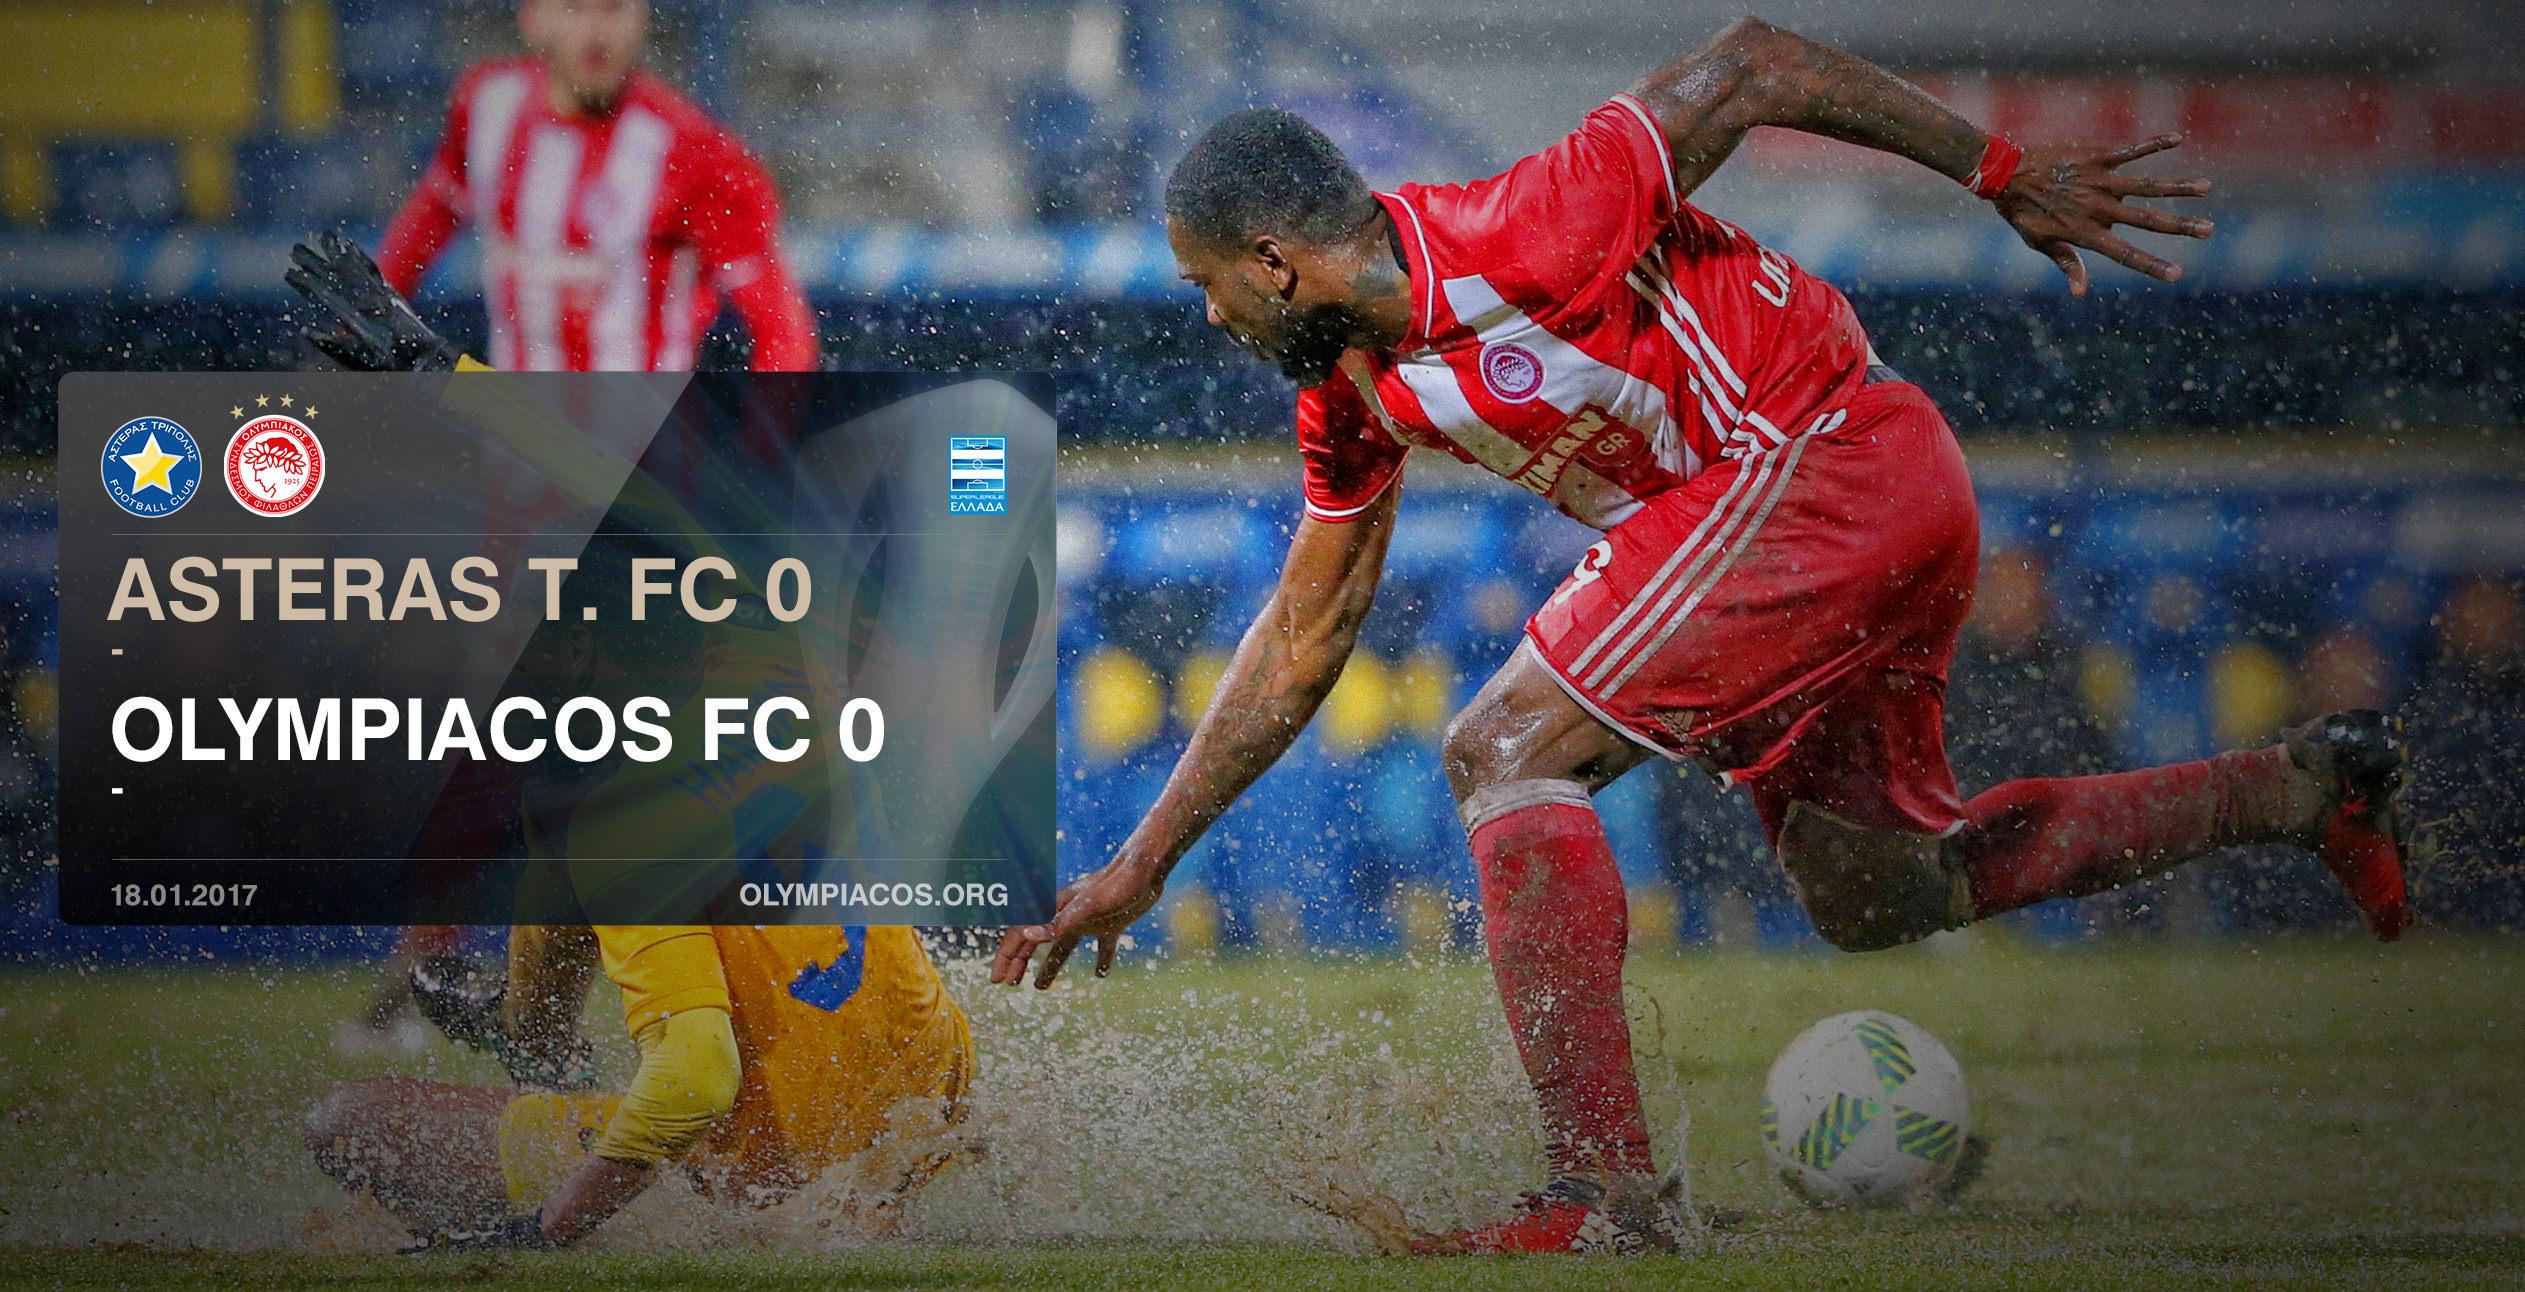 Asteras Tripolis – Olympiacos 0-0